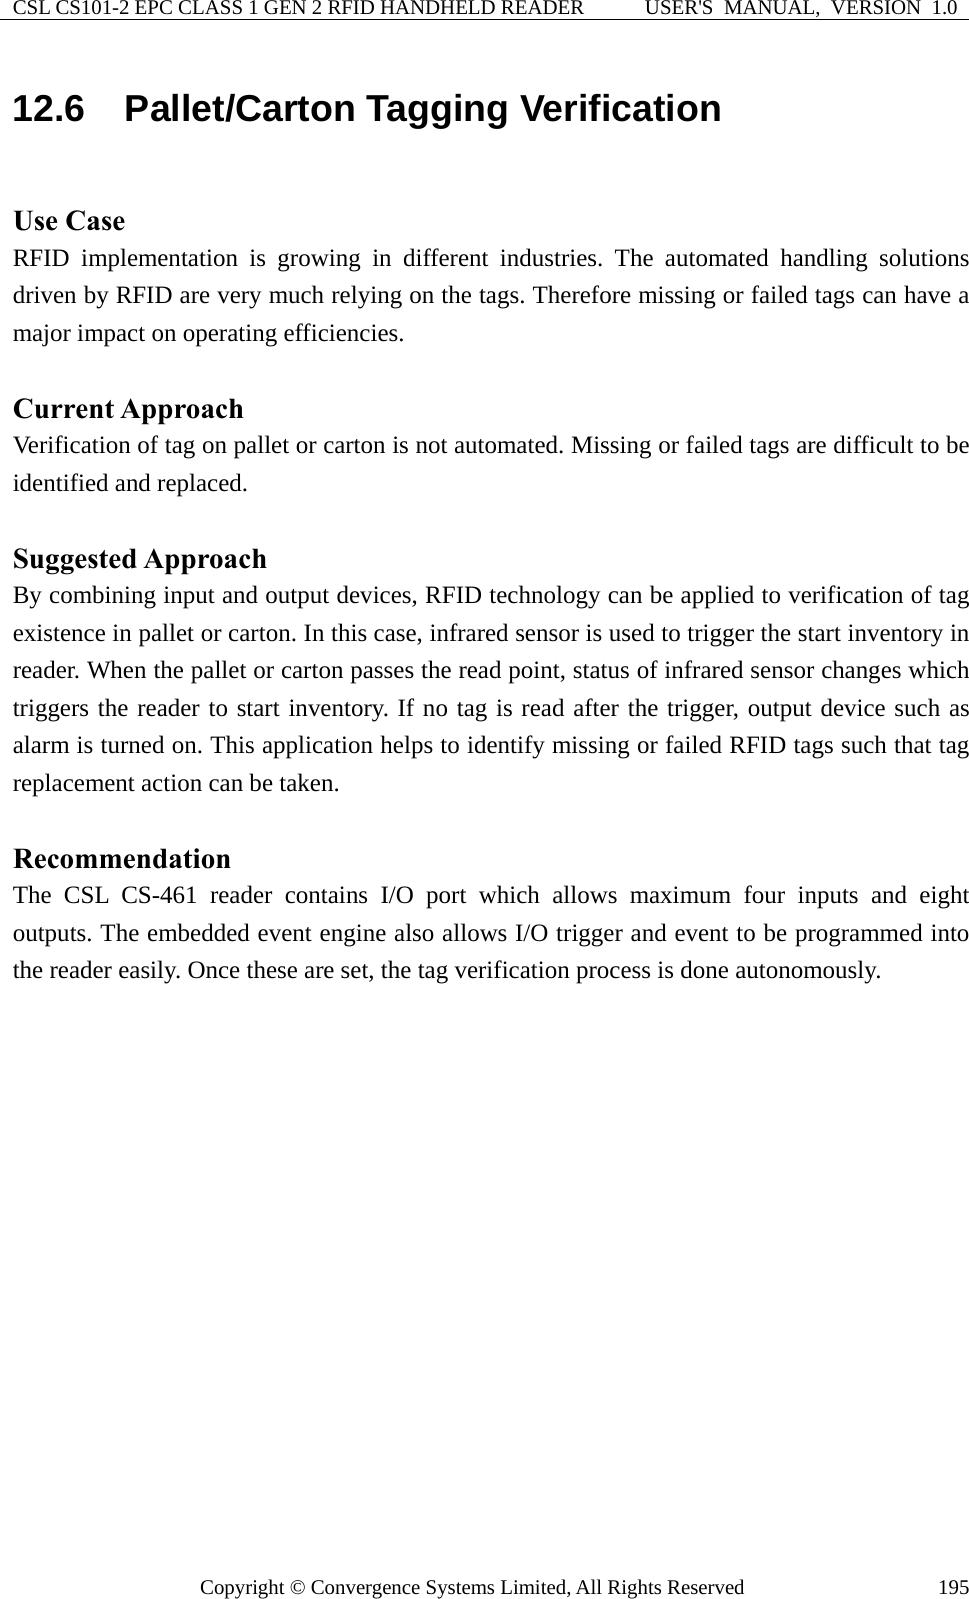 Convergence Systems CS101C1GEN2 Handheld Reader User Manual appendix